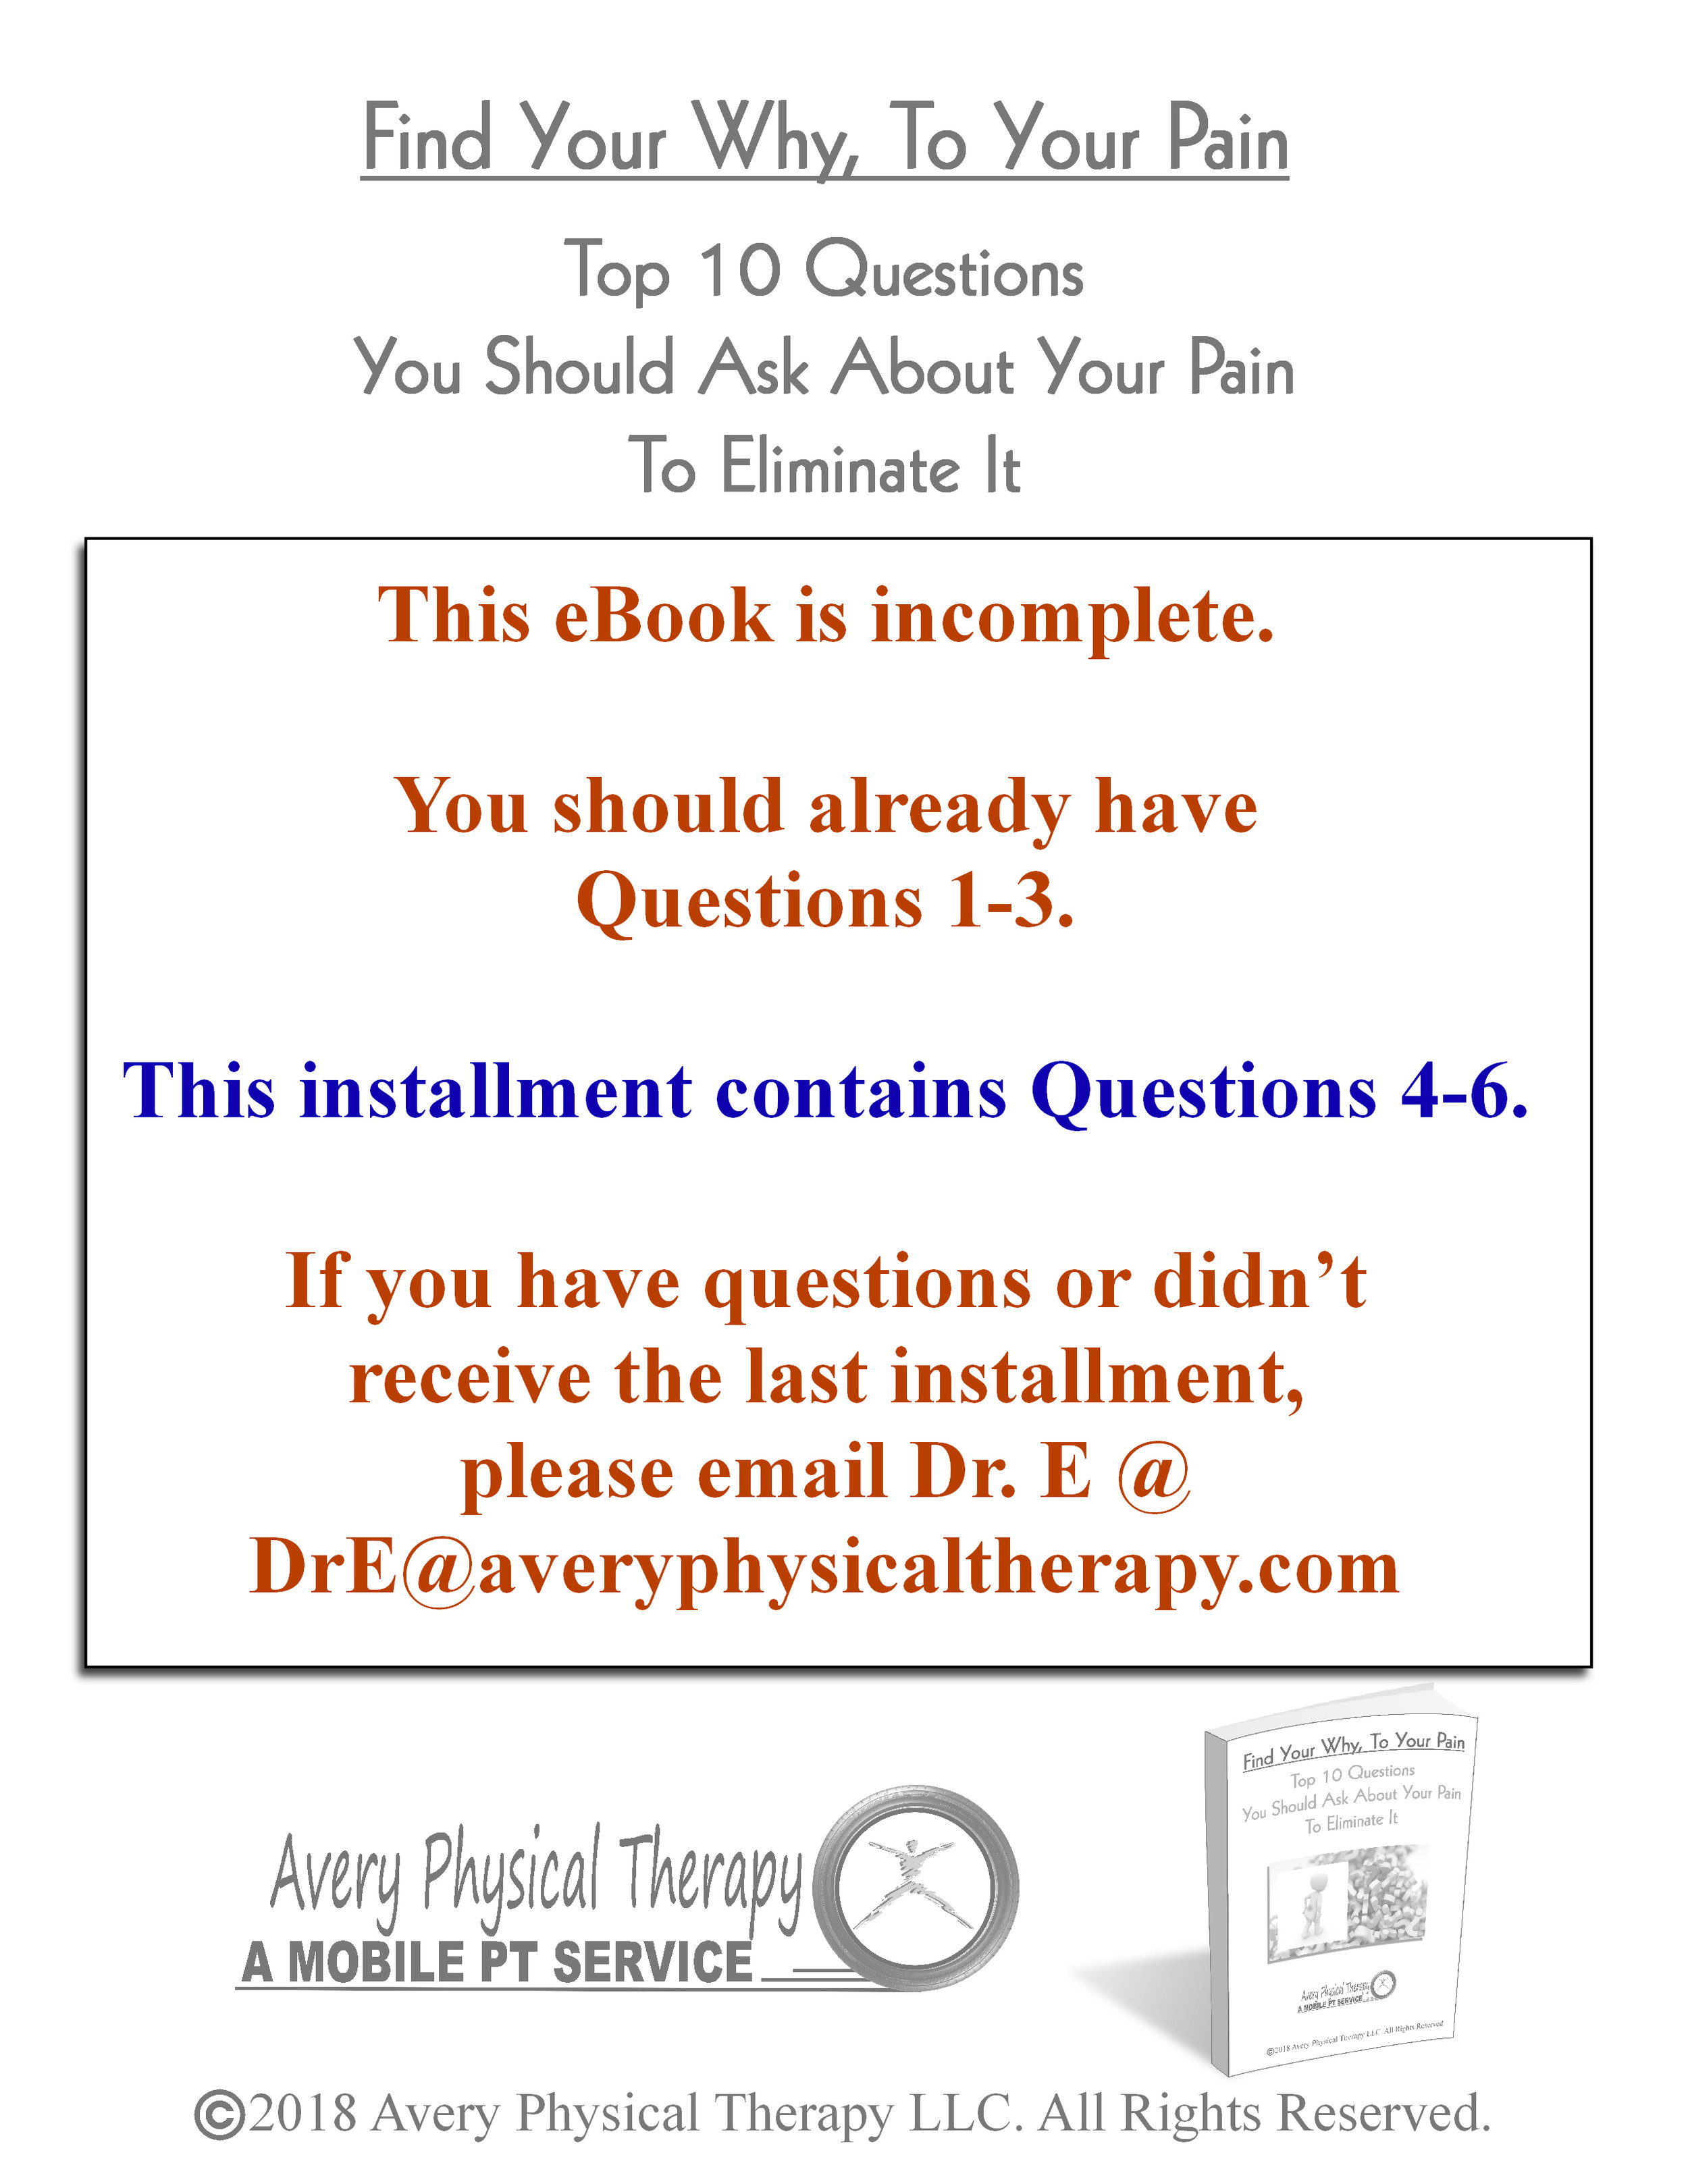 Top 10 Pain Questions 4-6D.JPG